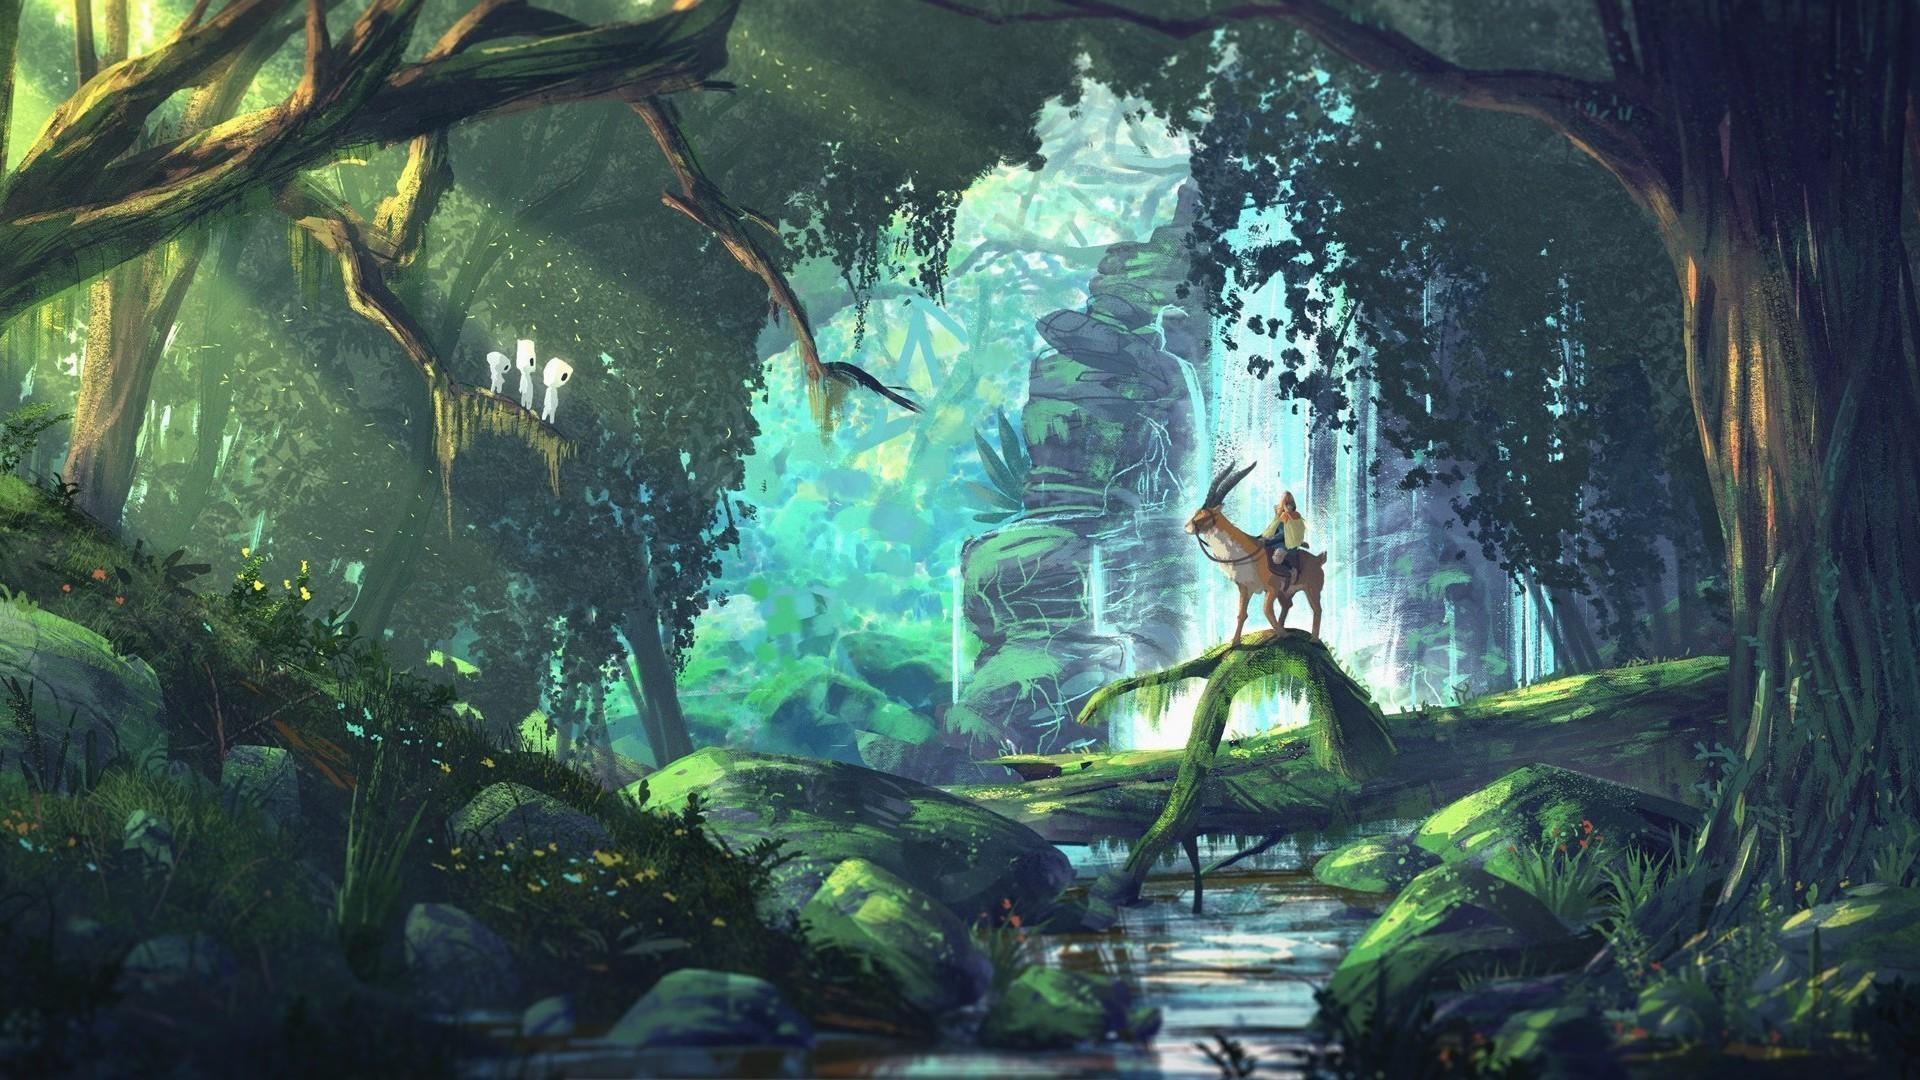 wallpaper.wiki-Cartoon-Studio-Ghibli-Backgrounds-PIC-WPE00803